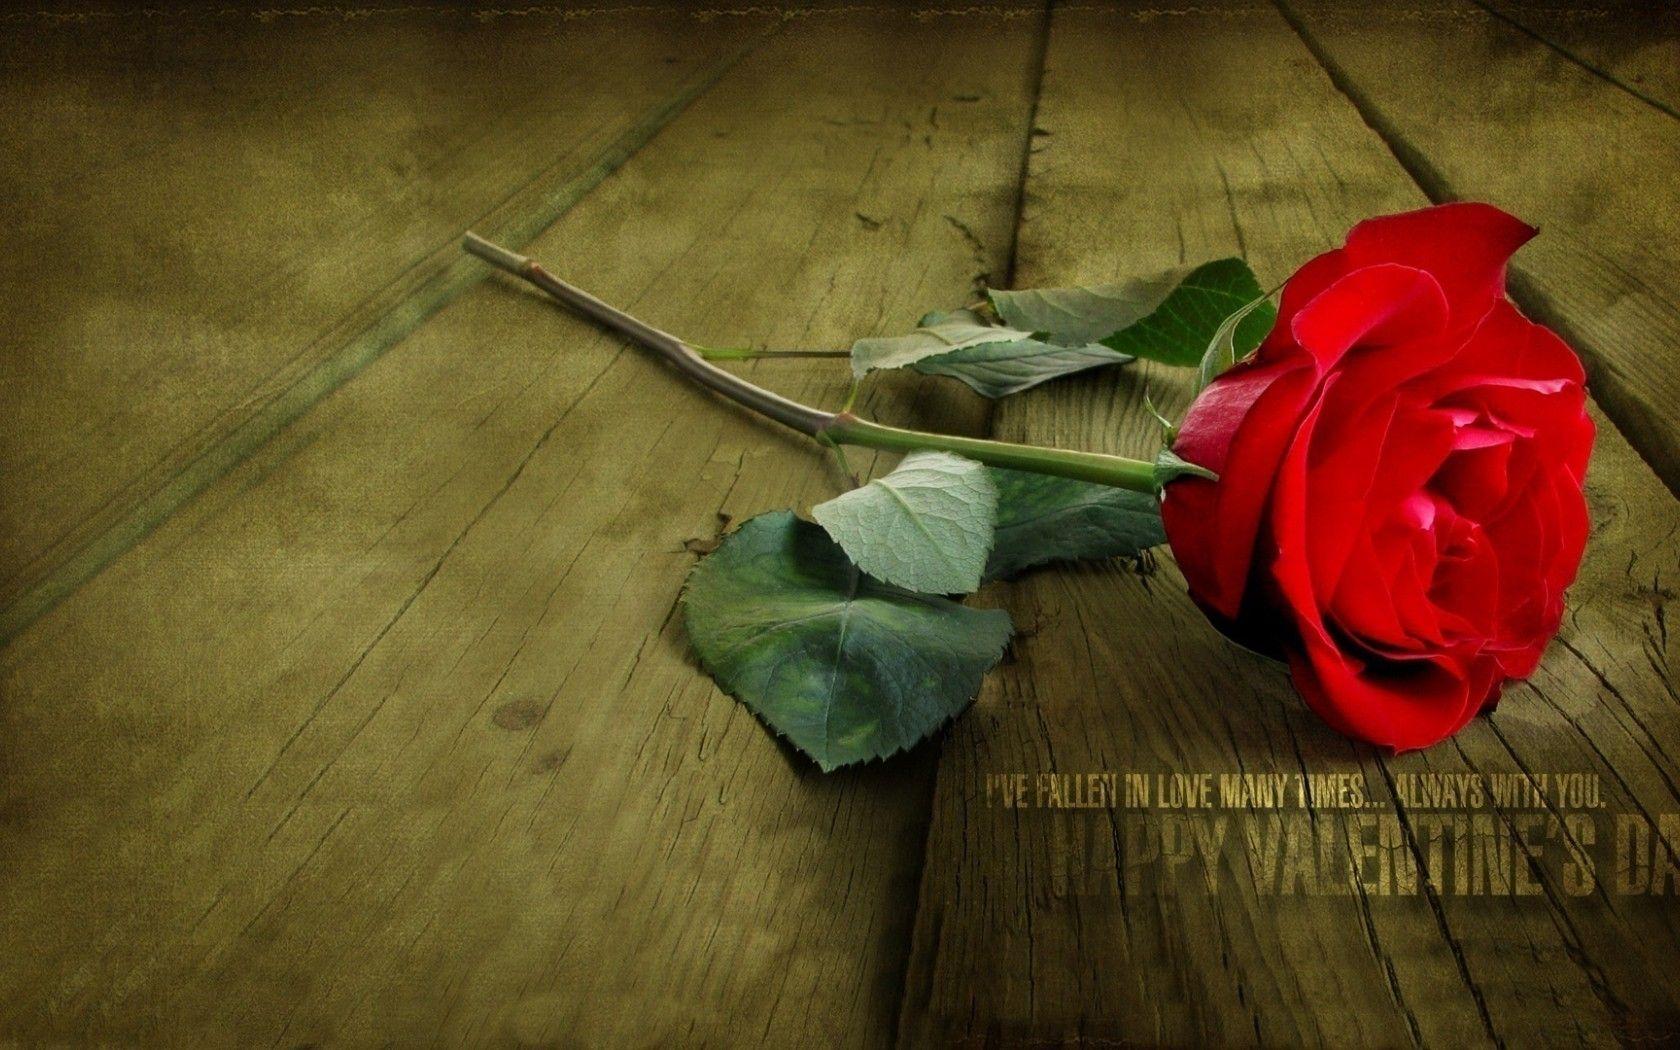 Wallpaper download love hd - Download Fallen In Love Happy Valentines Wallpaper Full Hd